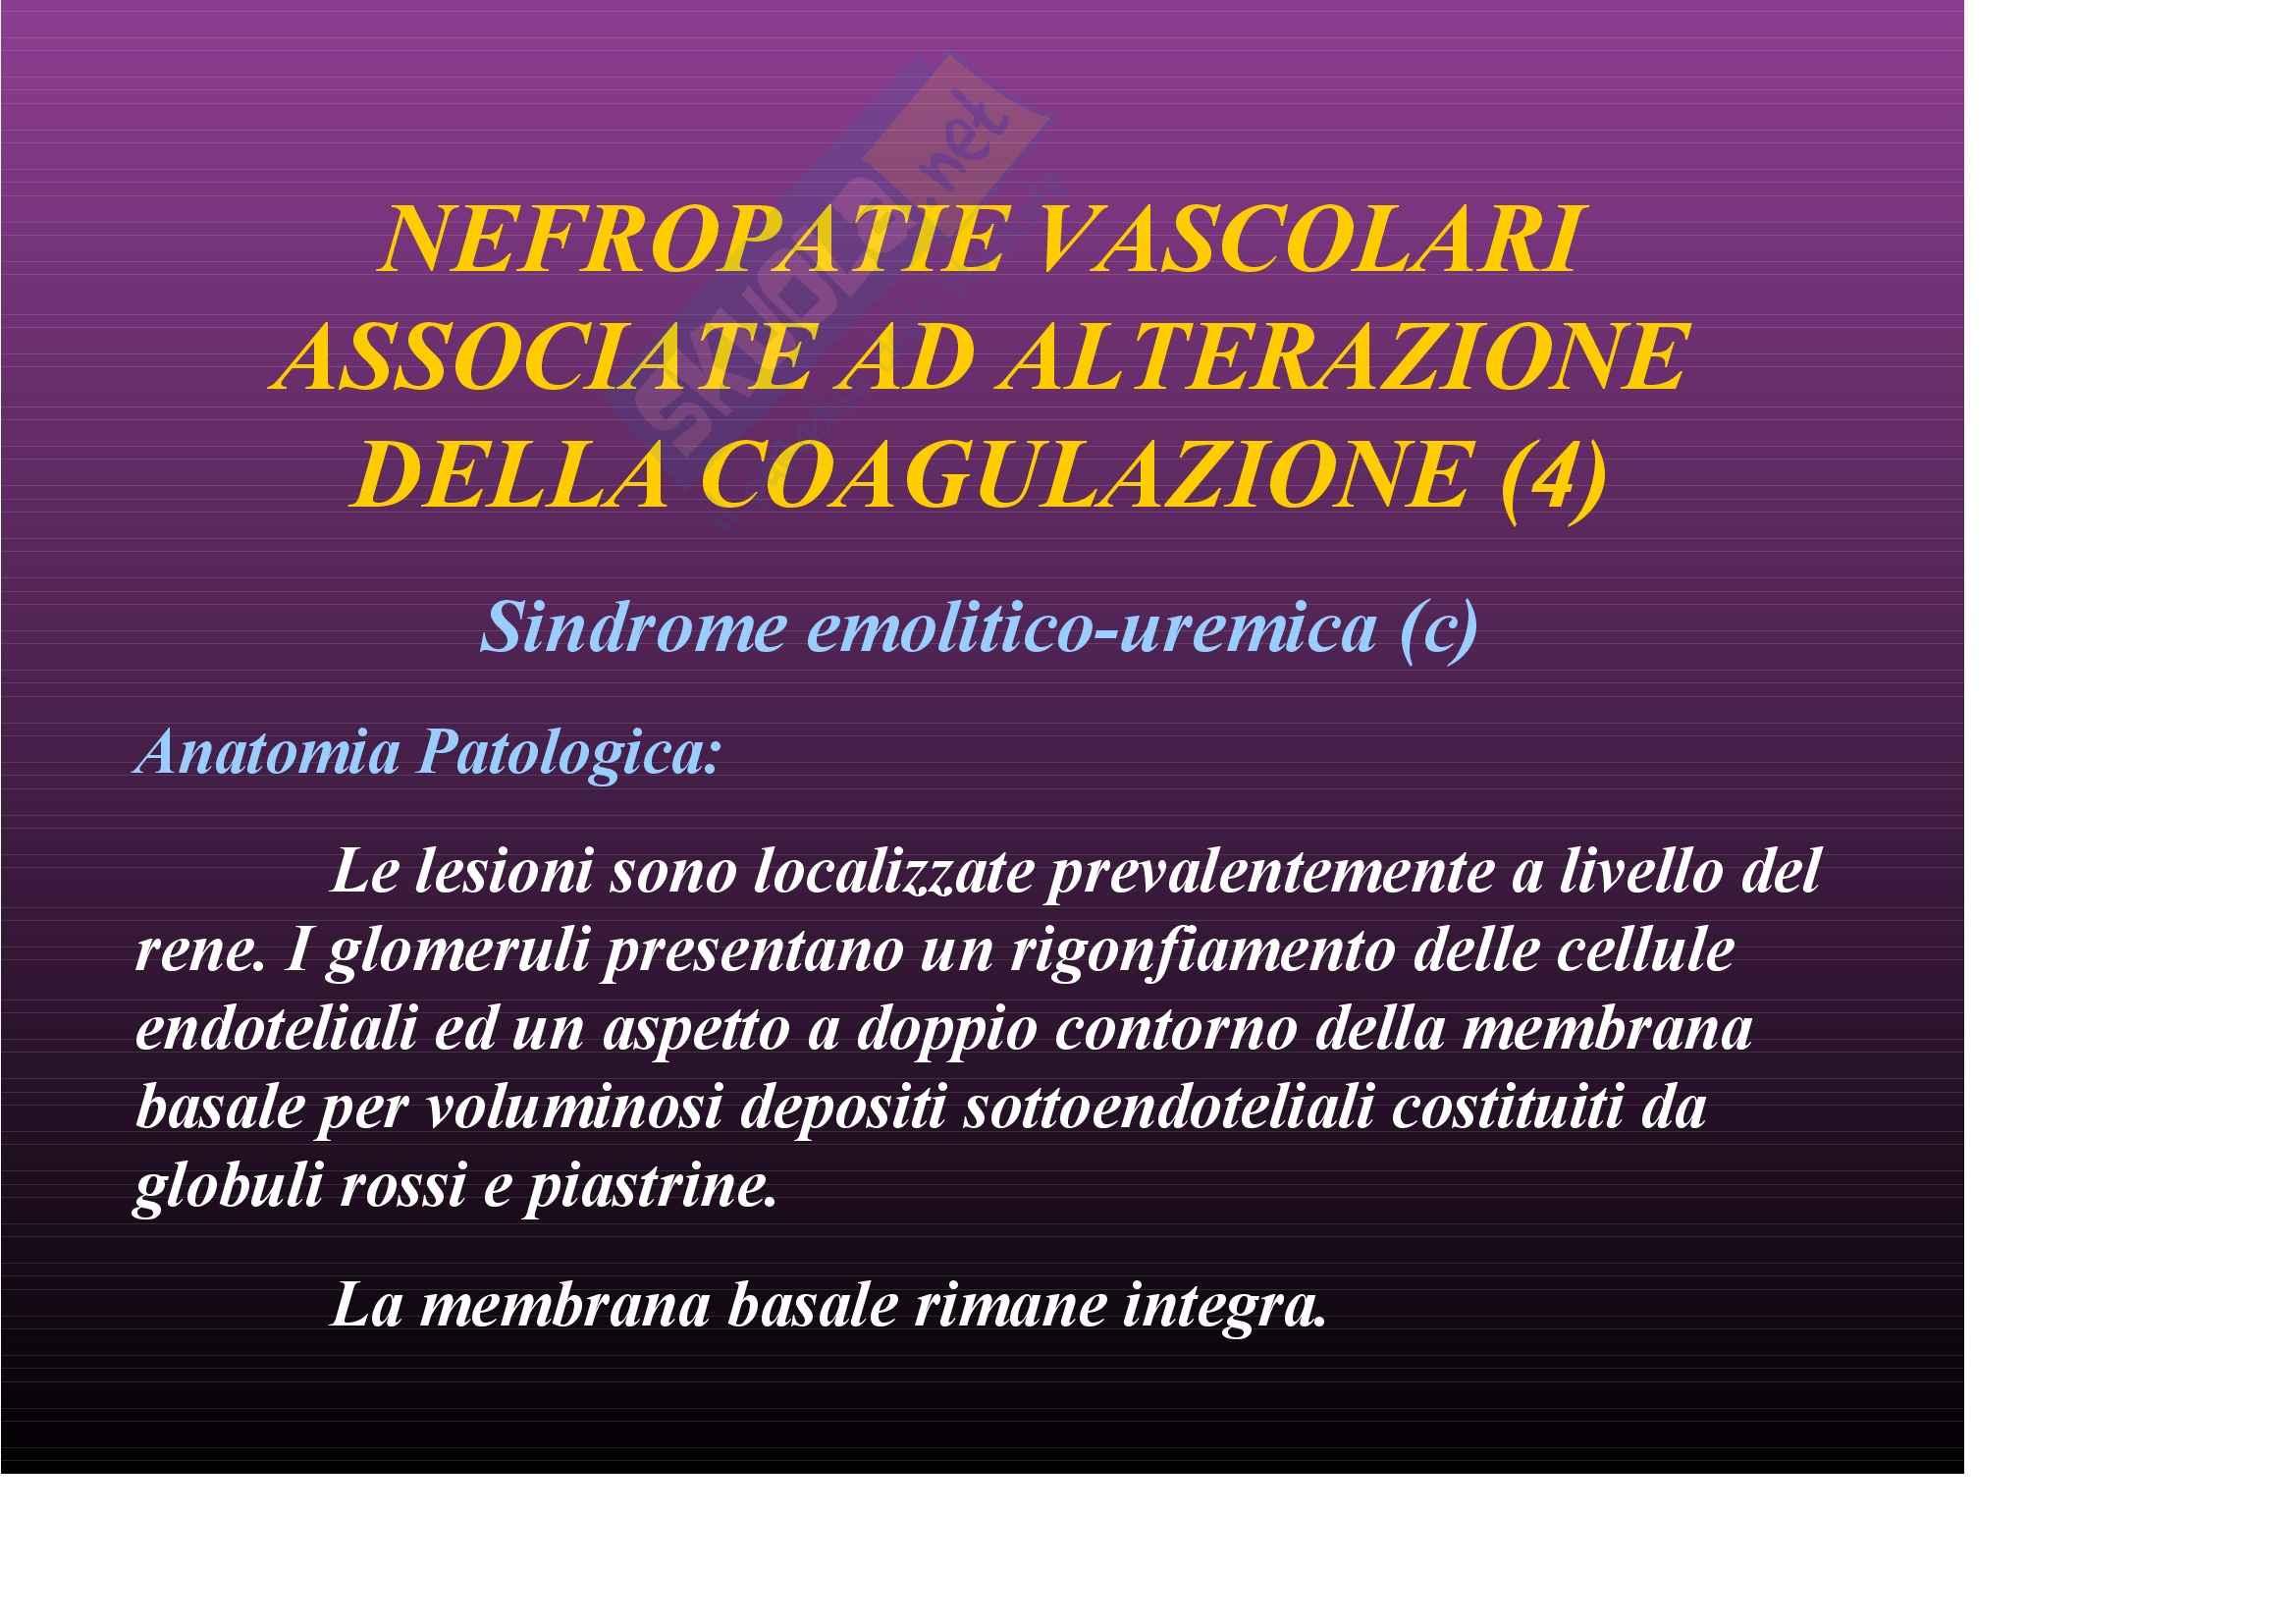 Nefrologia e urologia – Nefropatie vascolari Pag. 46